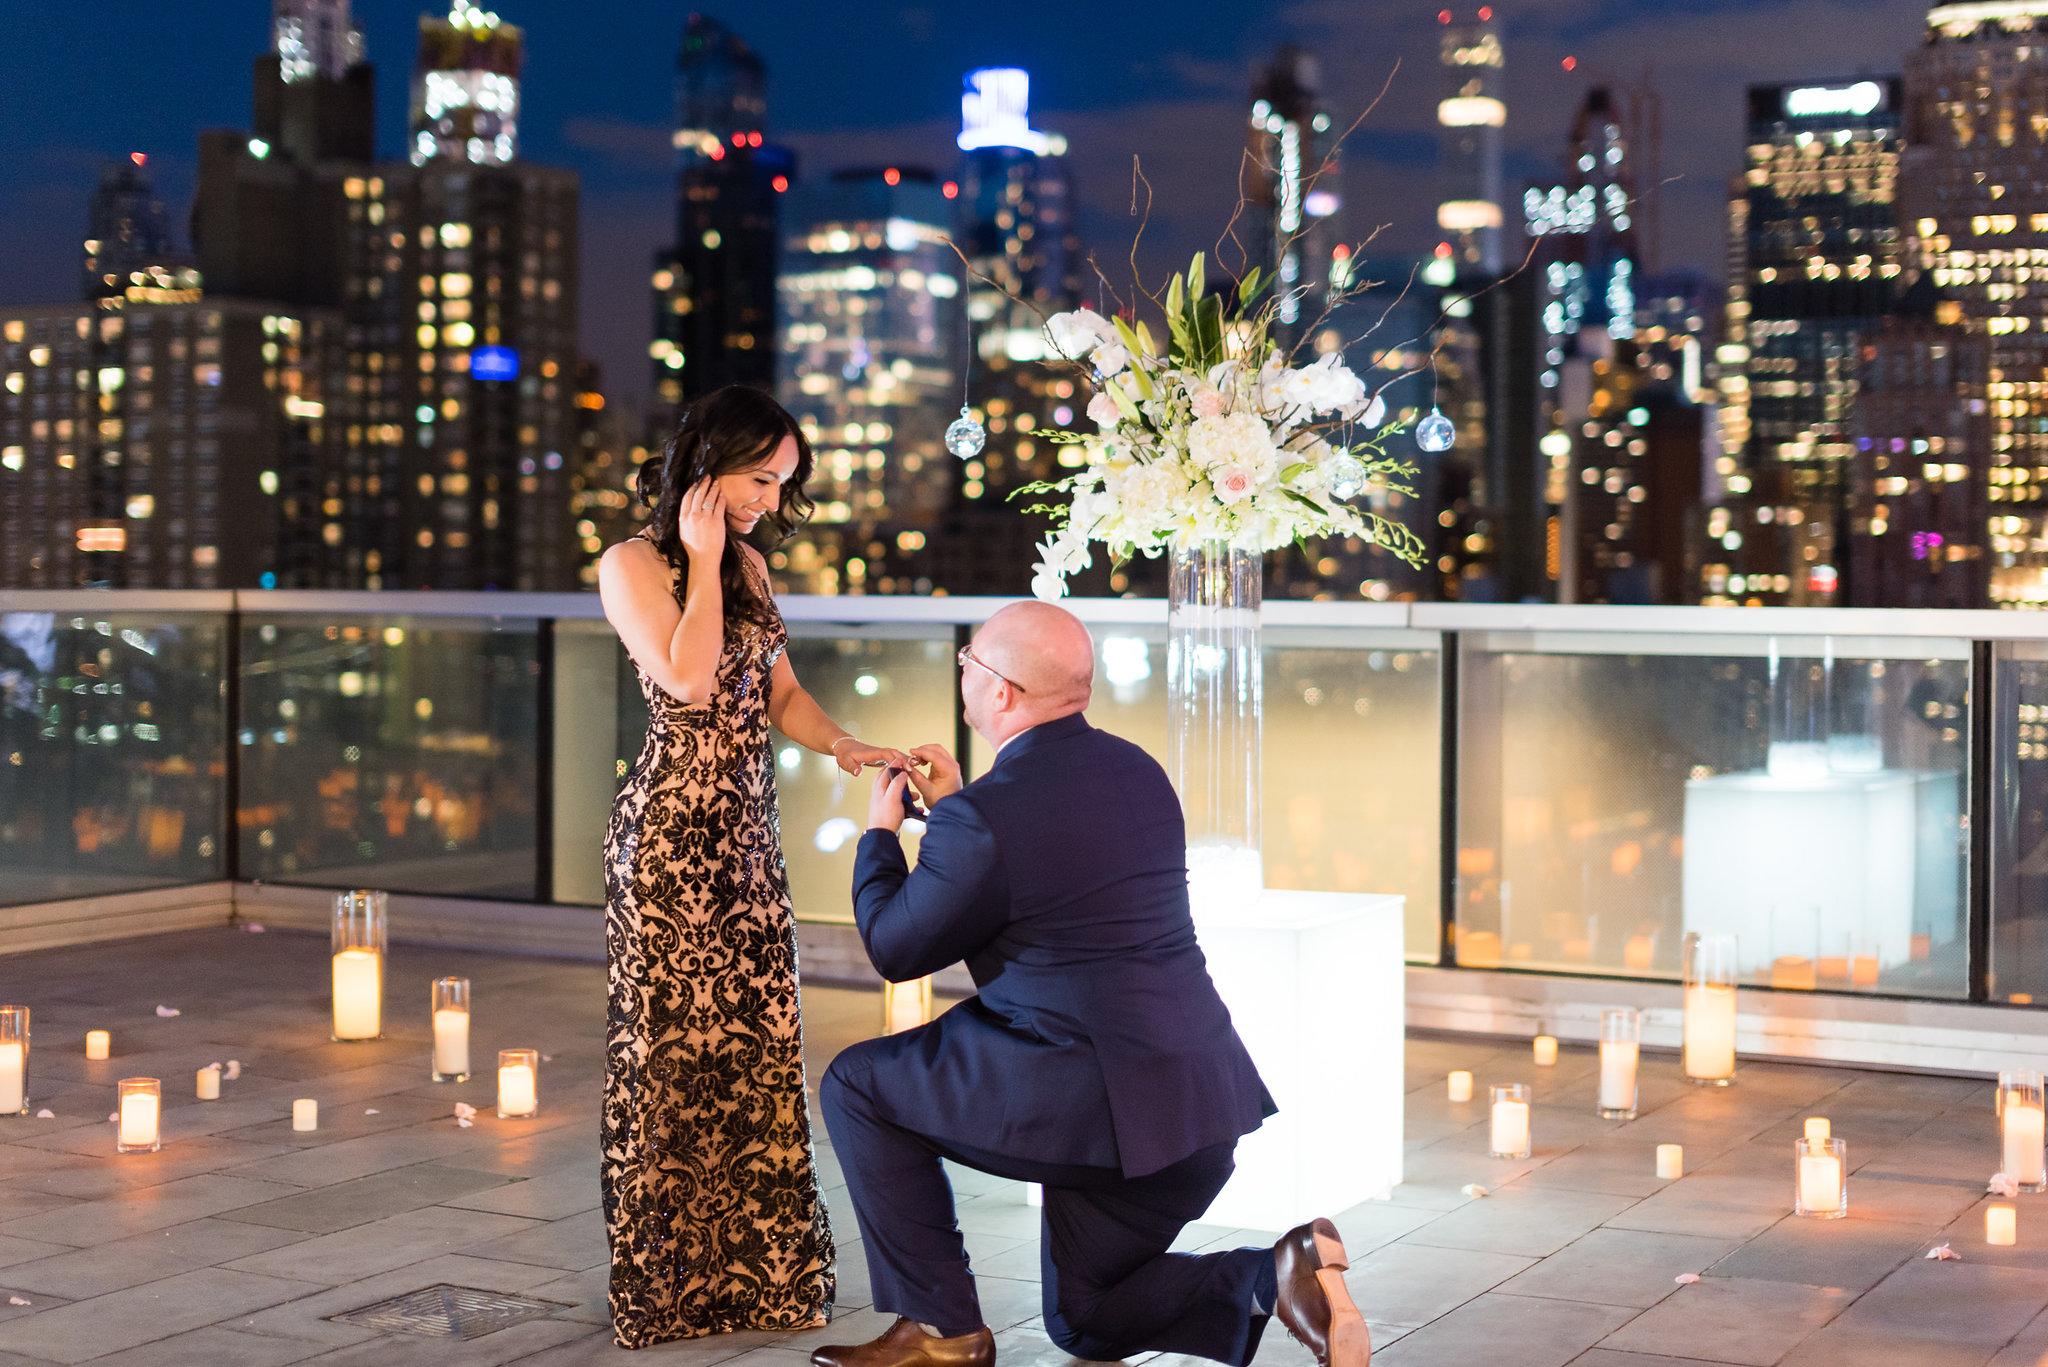 Kristina_Ben_marriage_proposal_Petronella_Photography_50.jpg